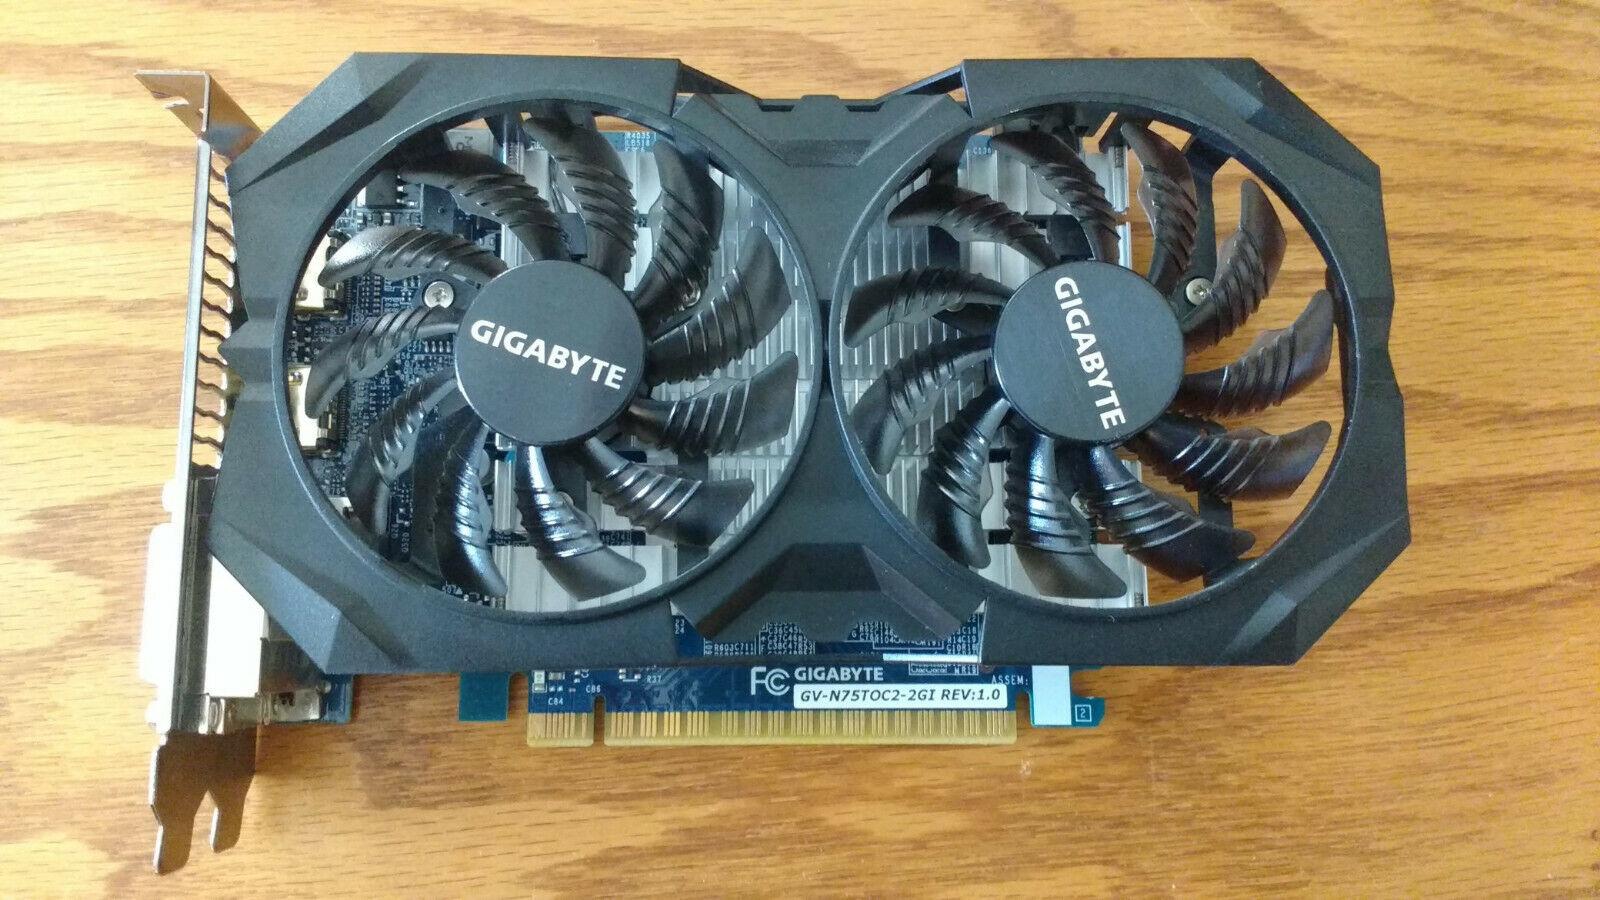 Gigabyte Geforce Gtx-750-Ti-2gb Windforce Graphics Card-GPU - Pre-owned 2